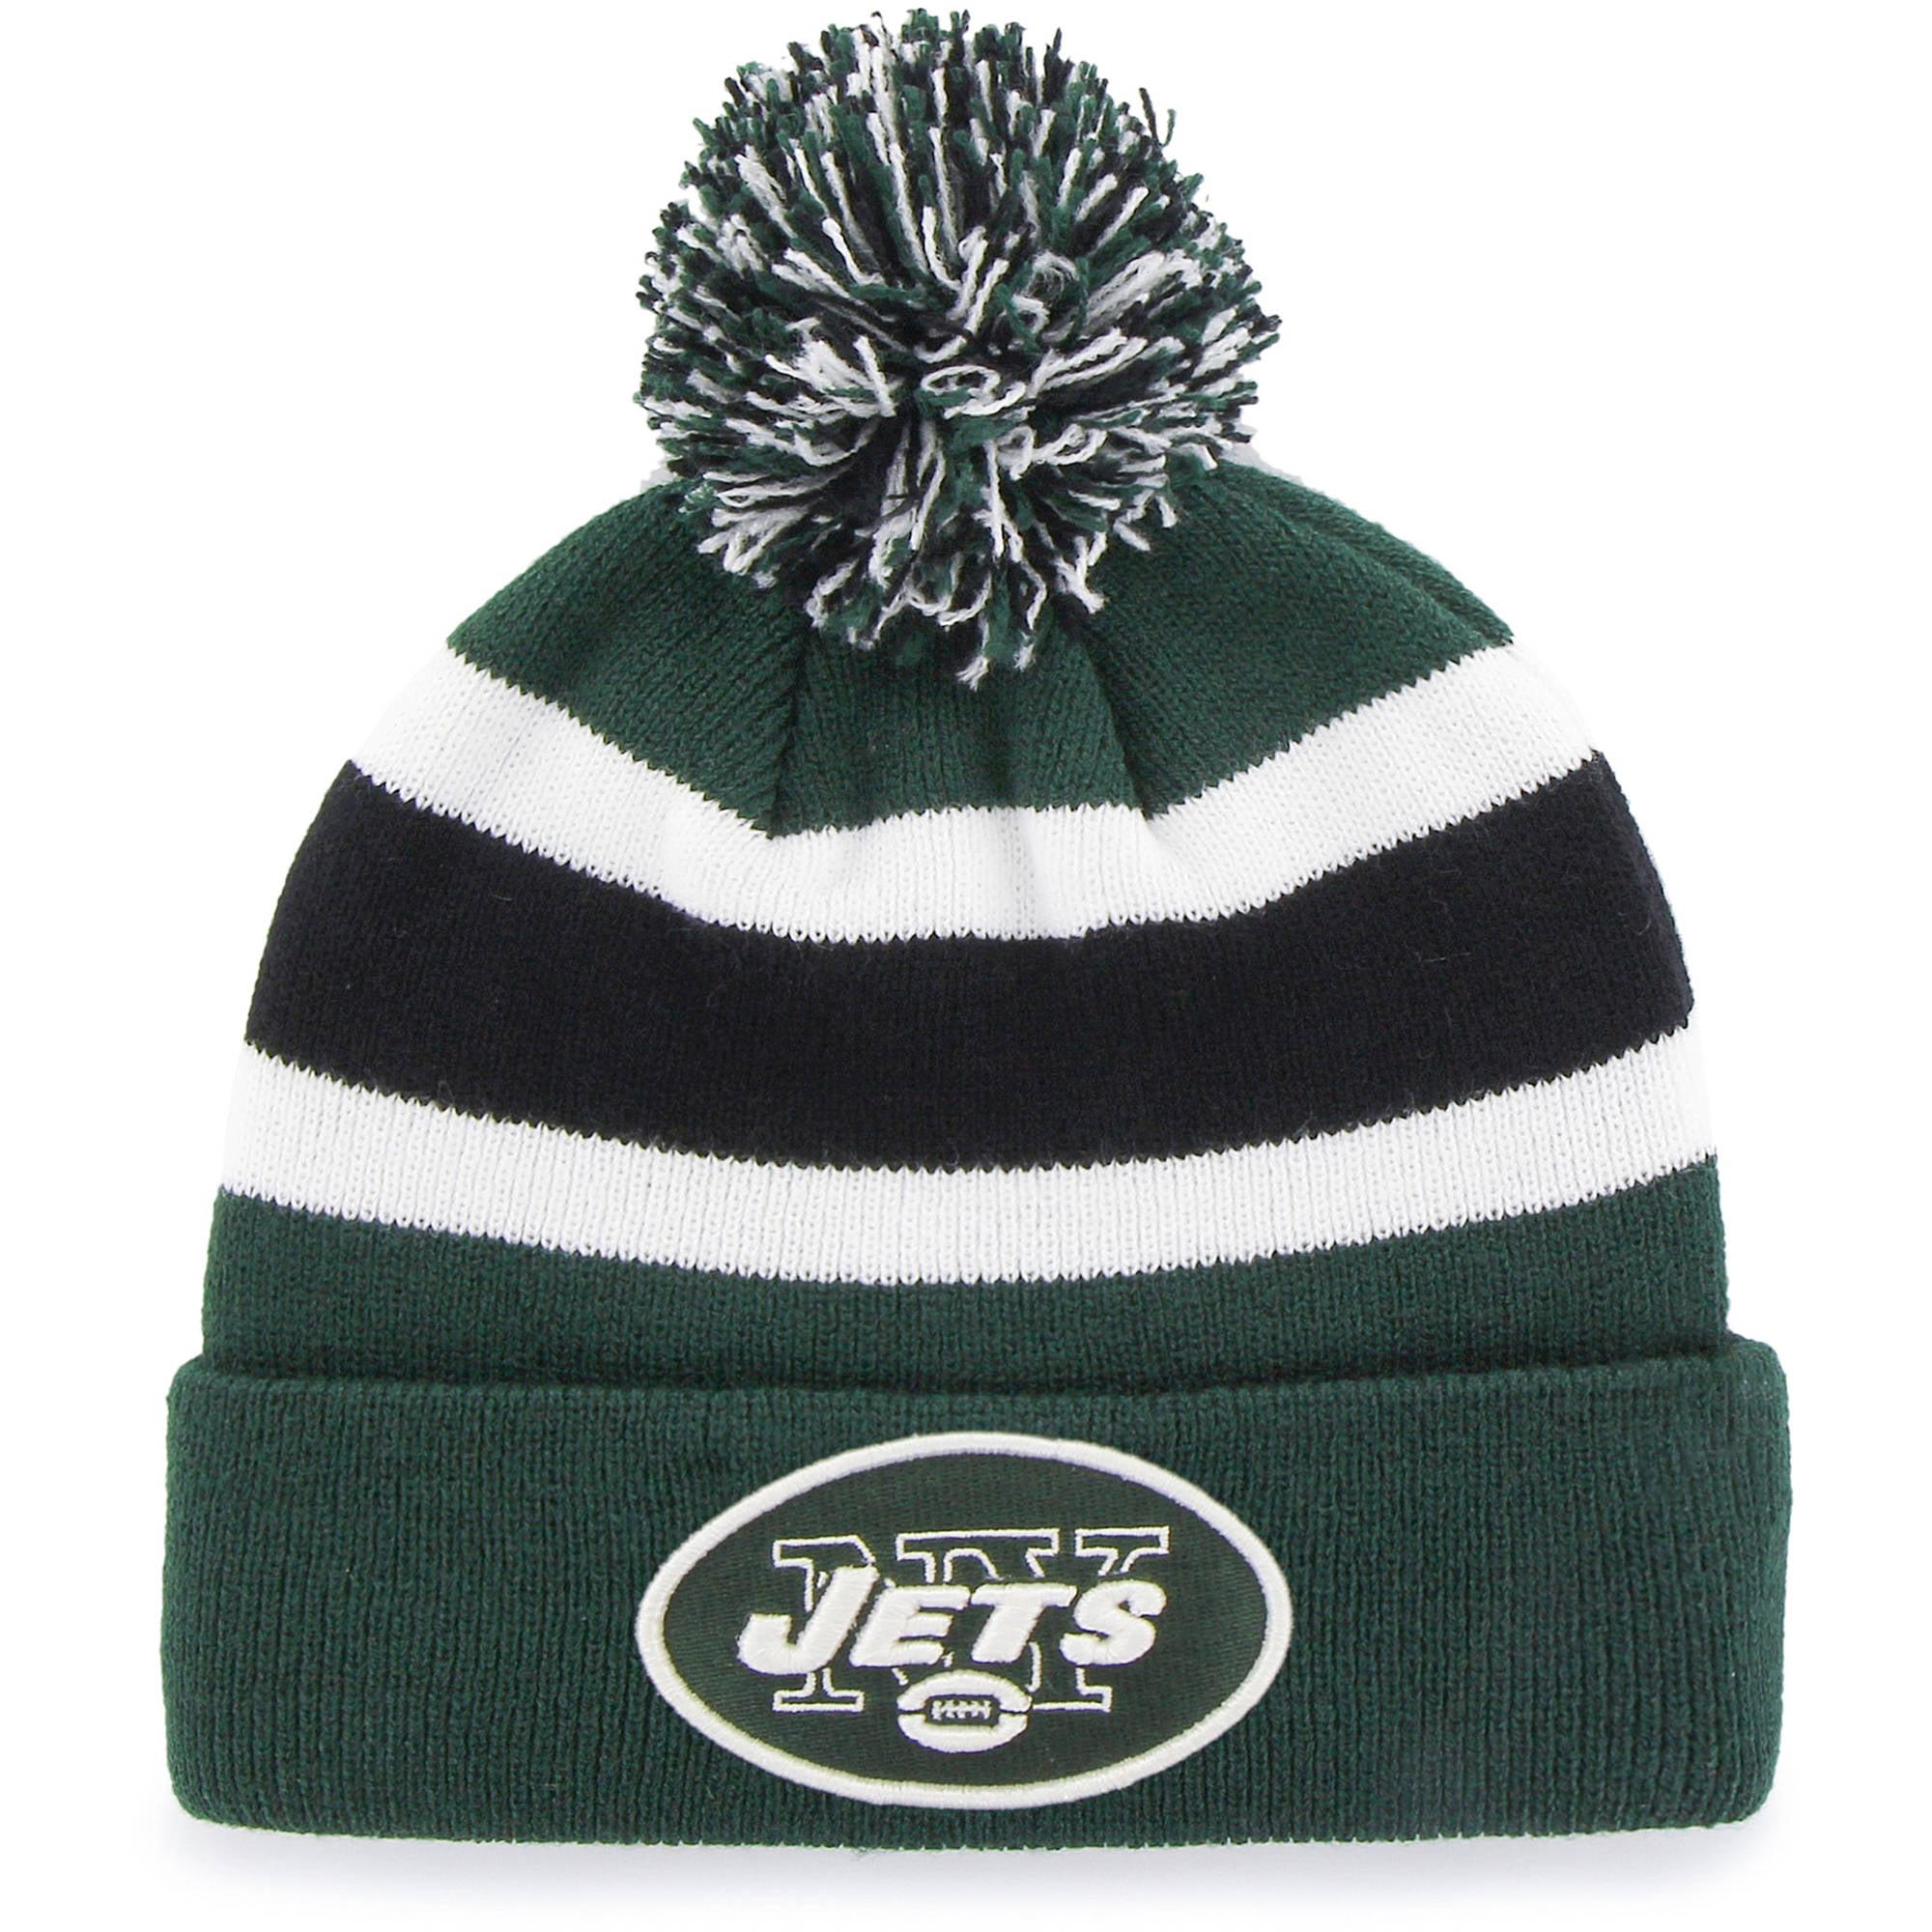 Fan Favorite - Breakaway Beanie with Pom, New York Jets